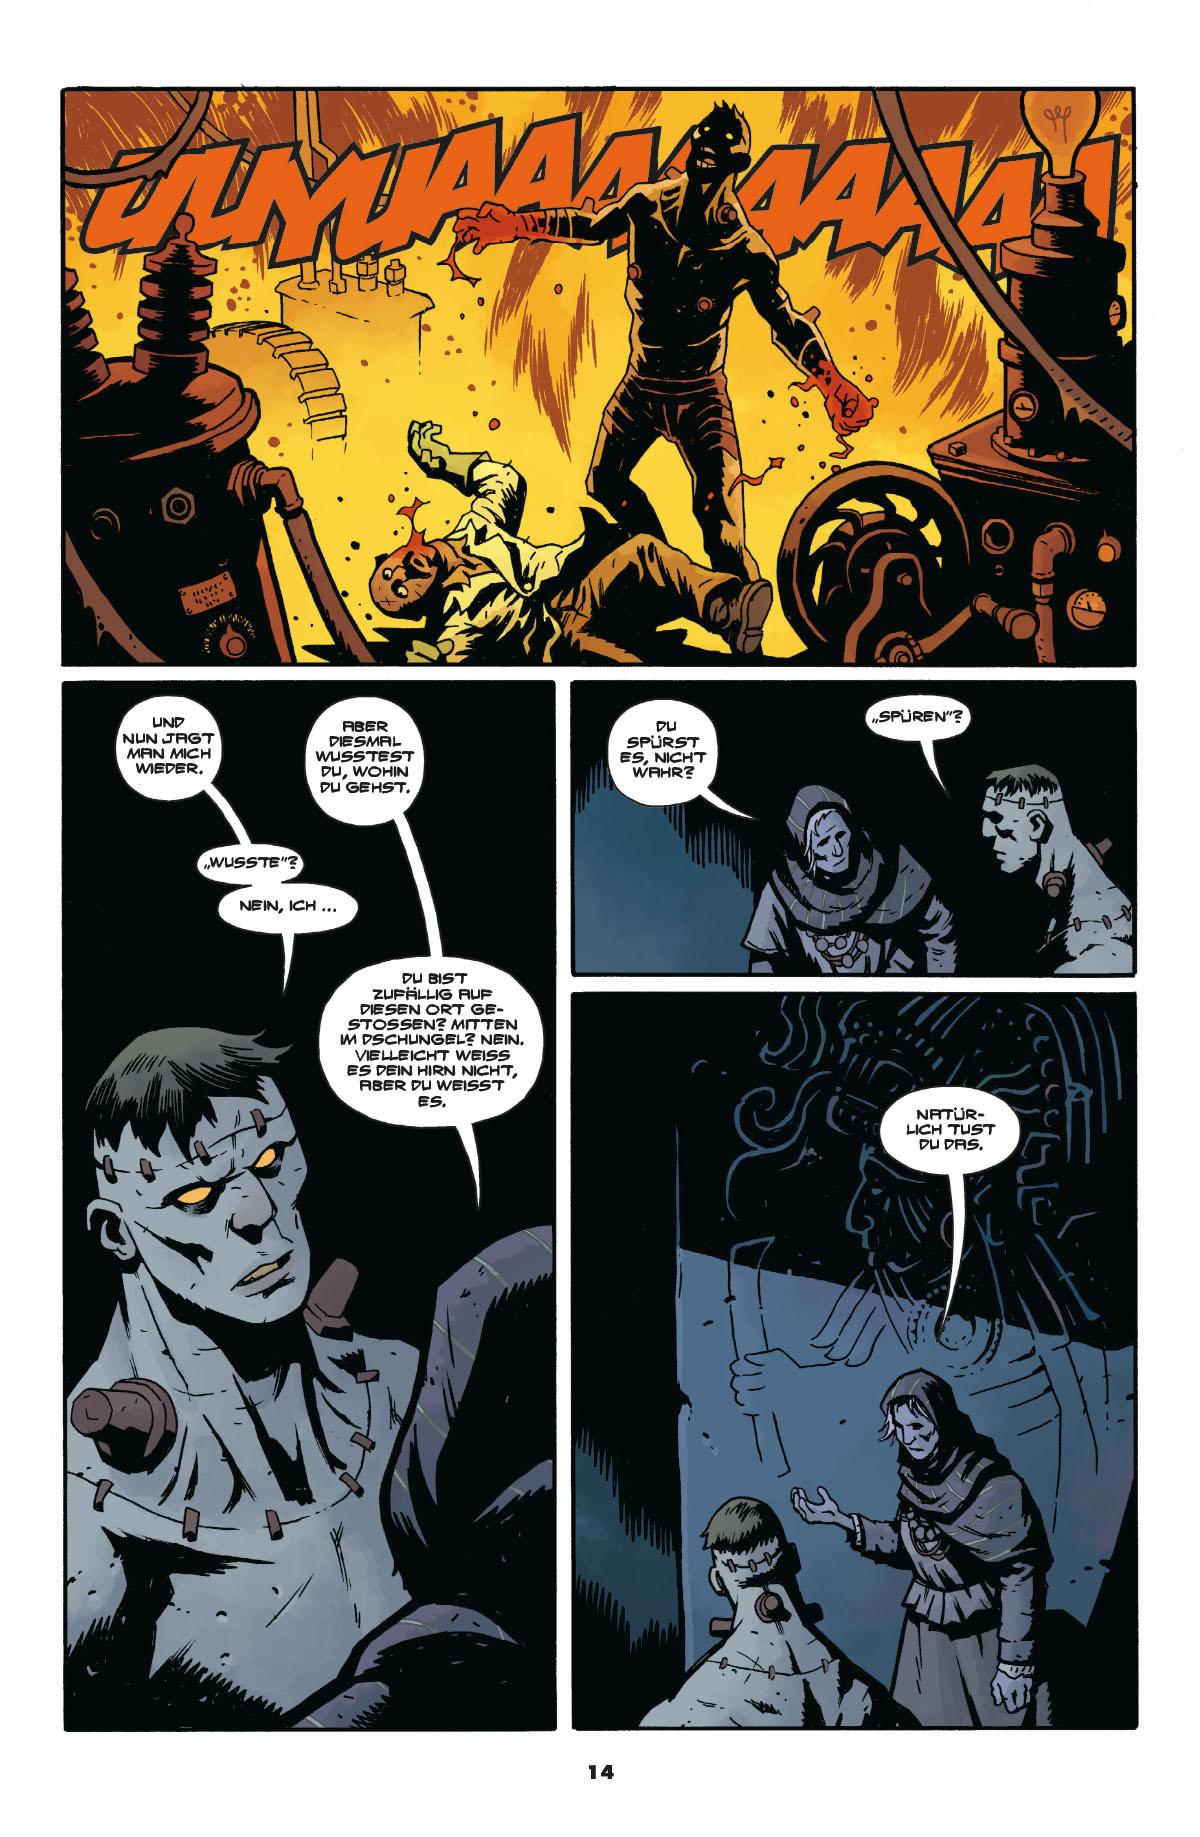 In Mary Shelley's novel Frankenstein, why does Victor Frankenstein create the monster?